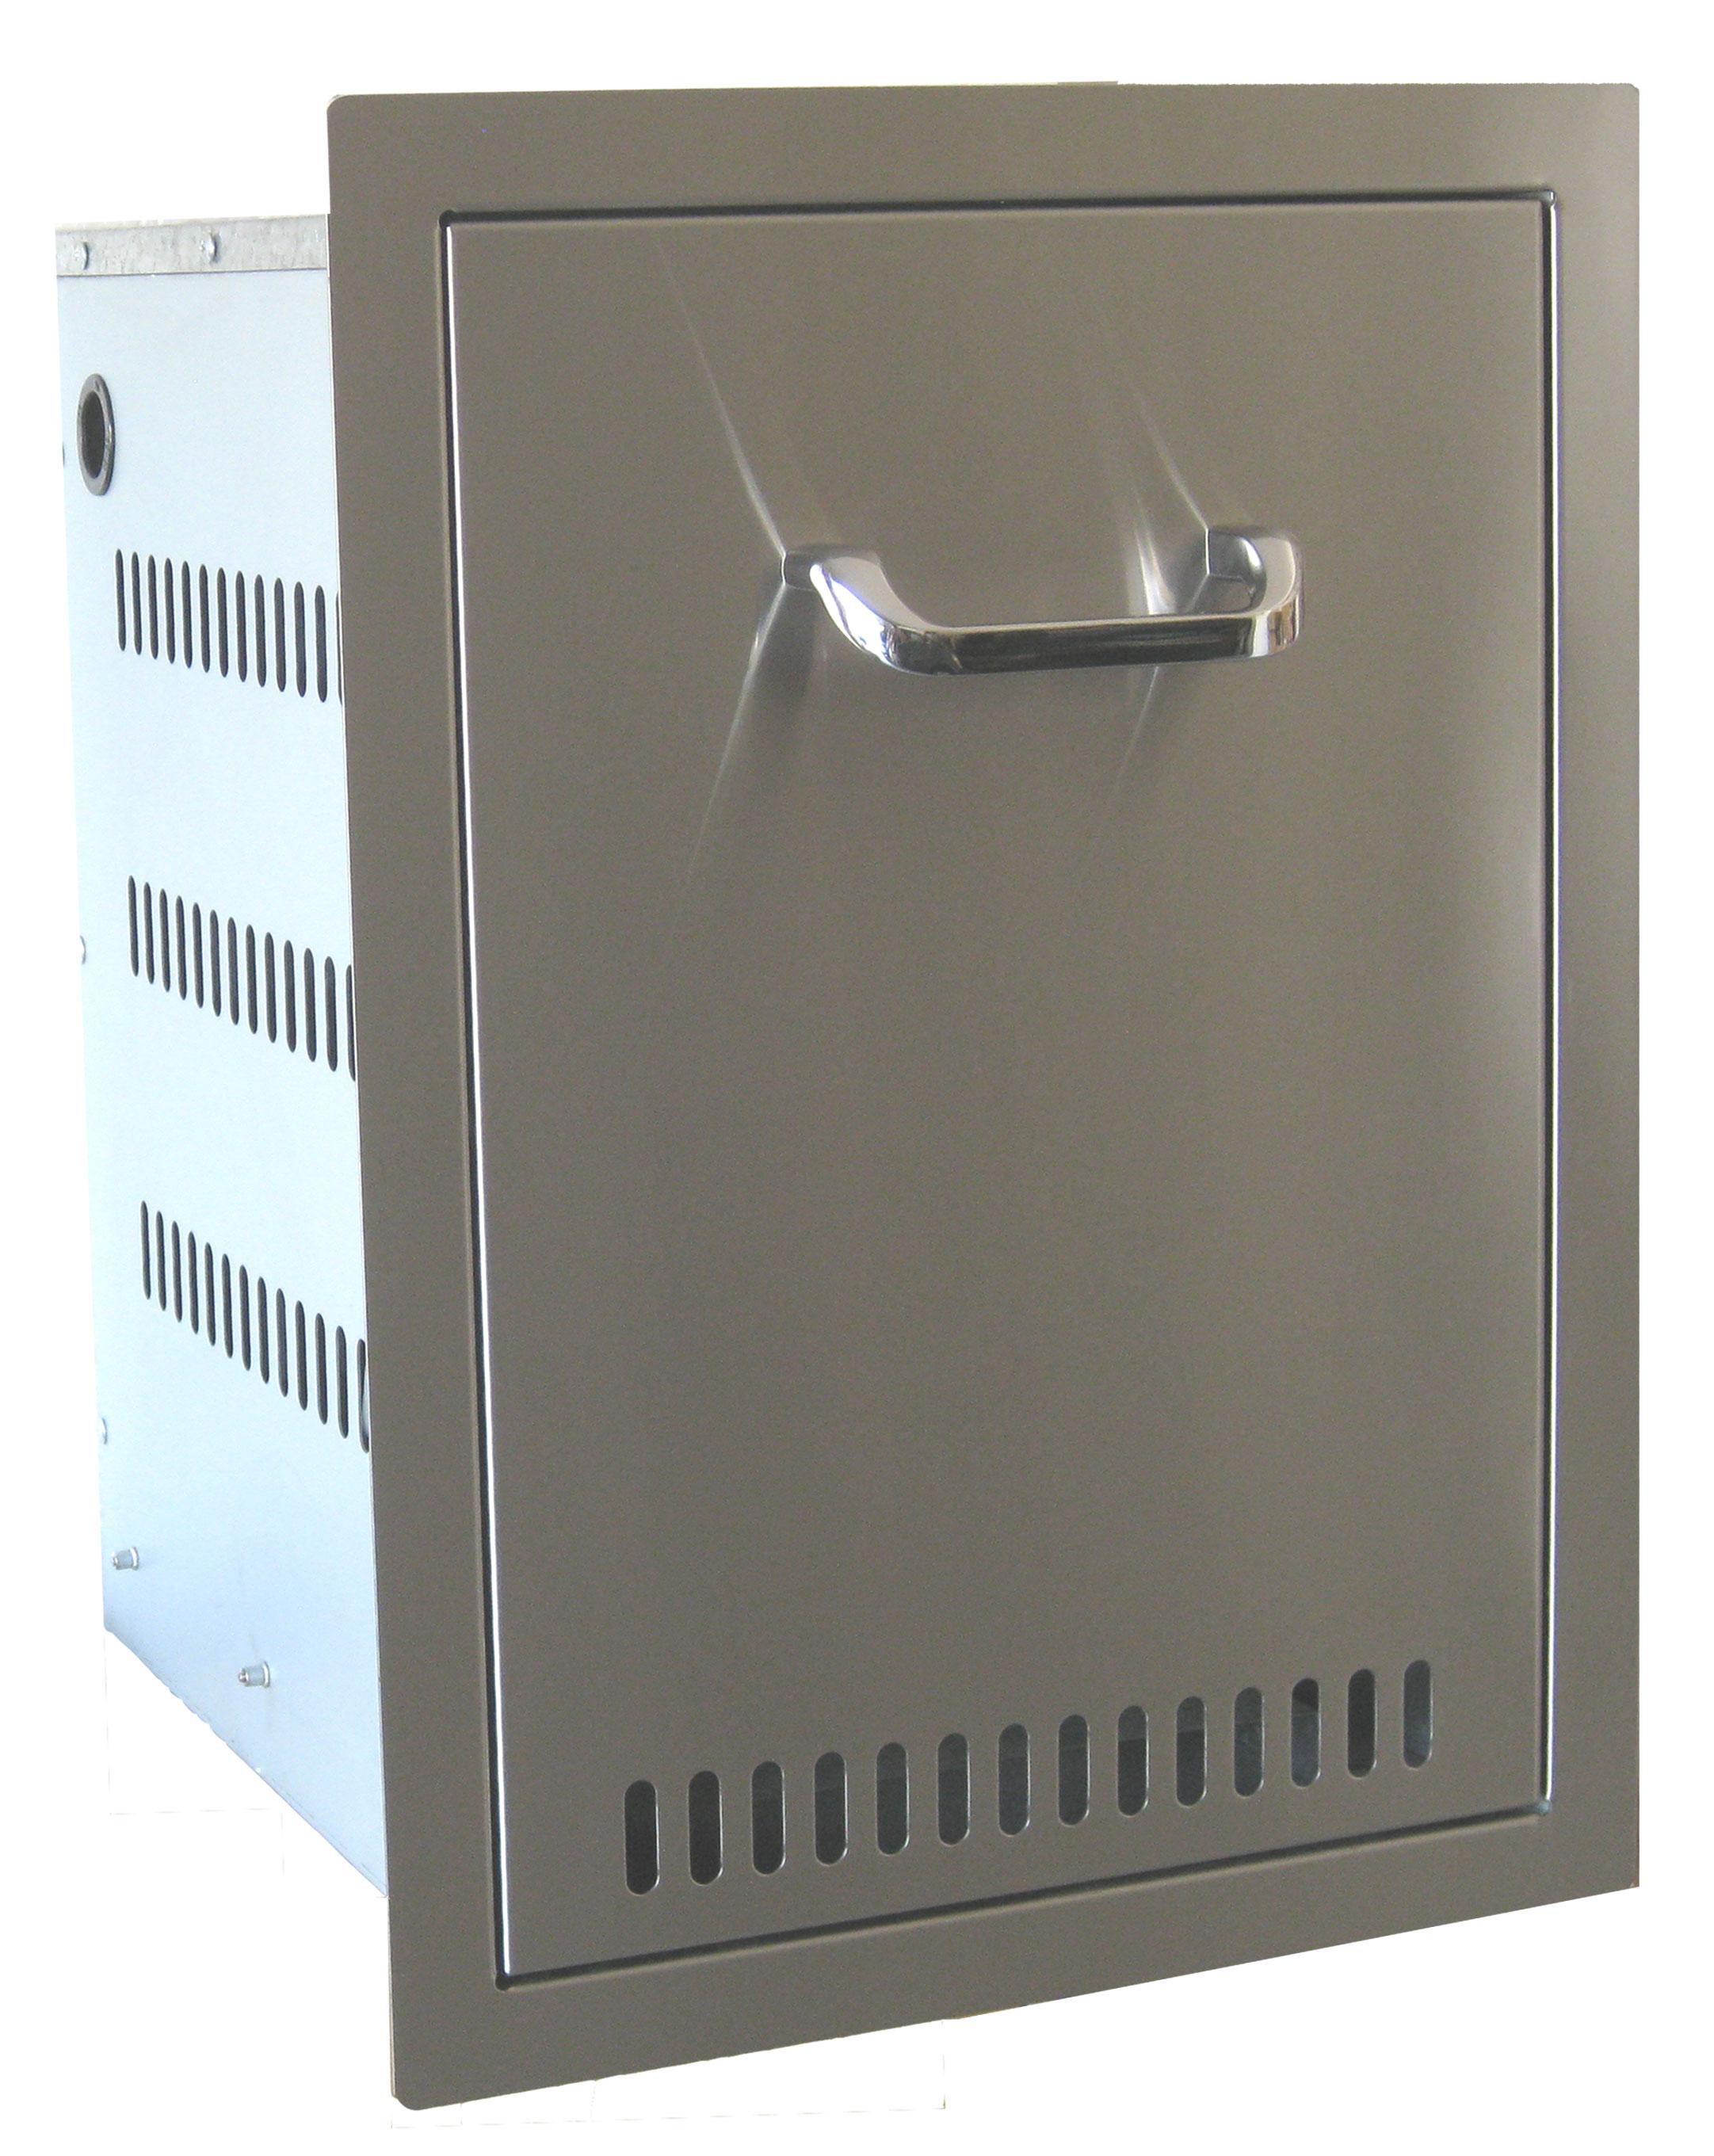 24210-stainless-steel-propane-tank-drawer.jpg